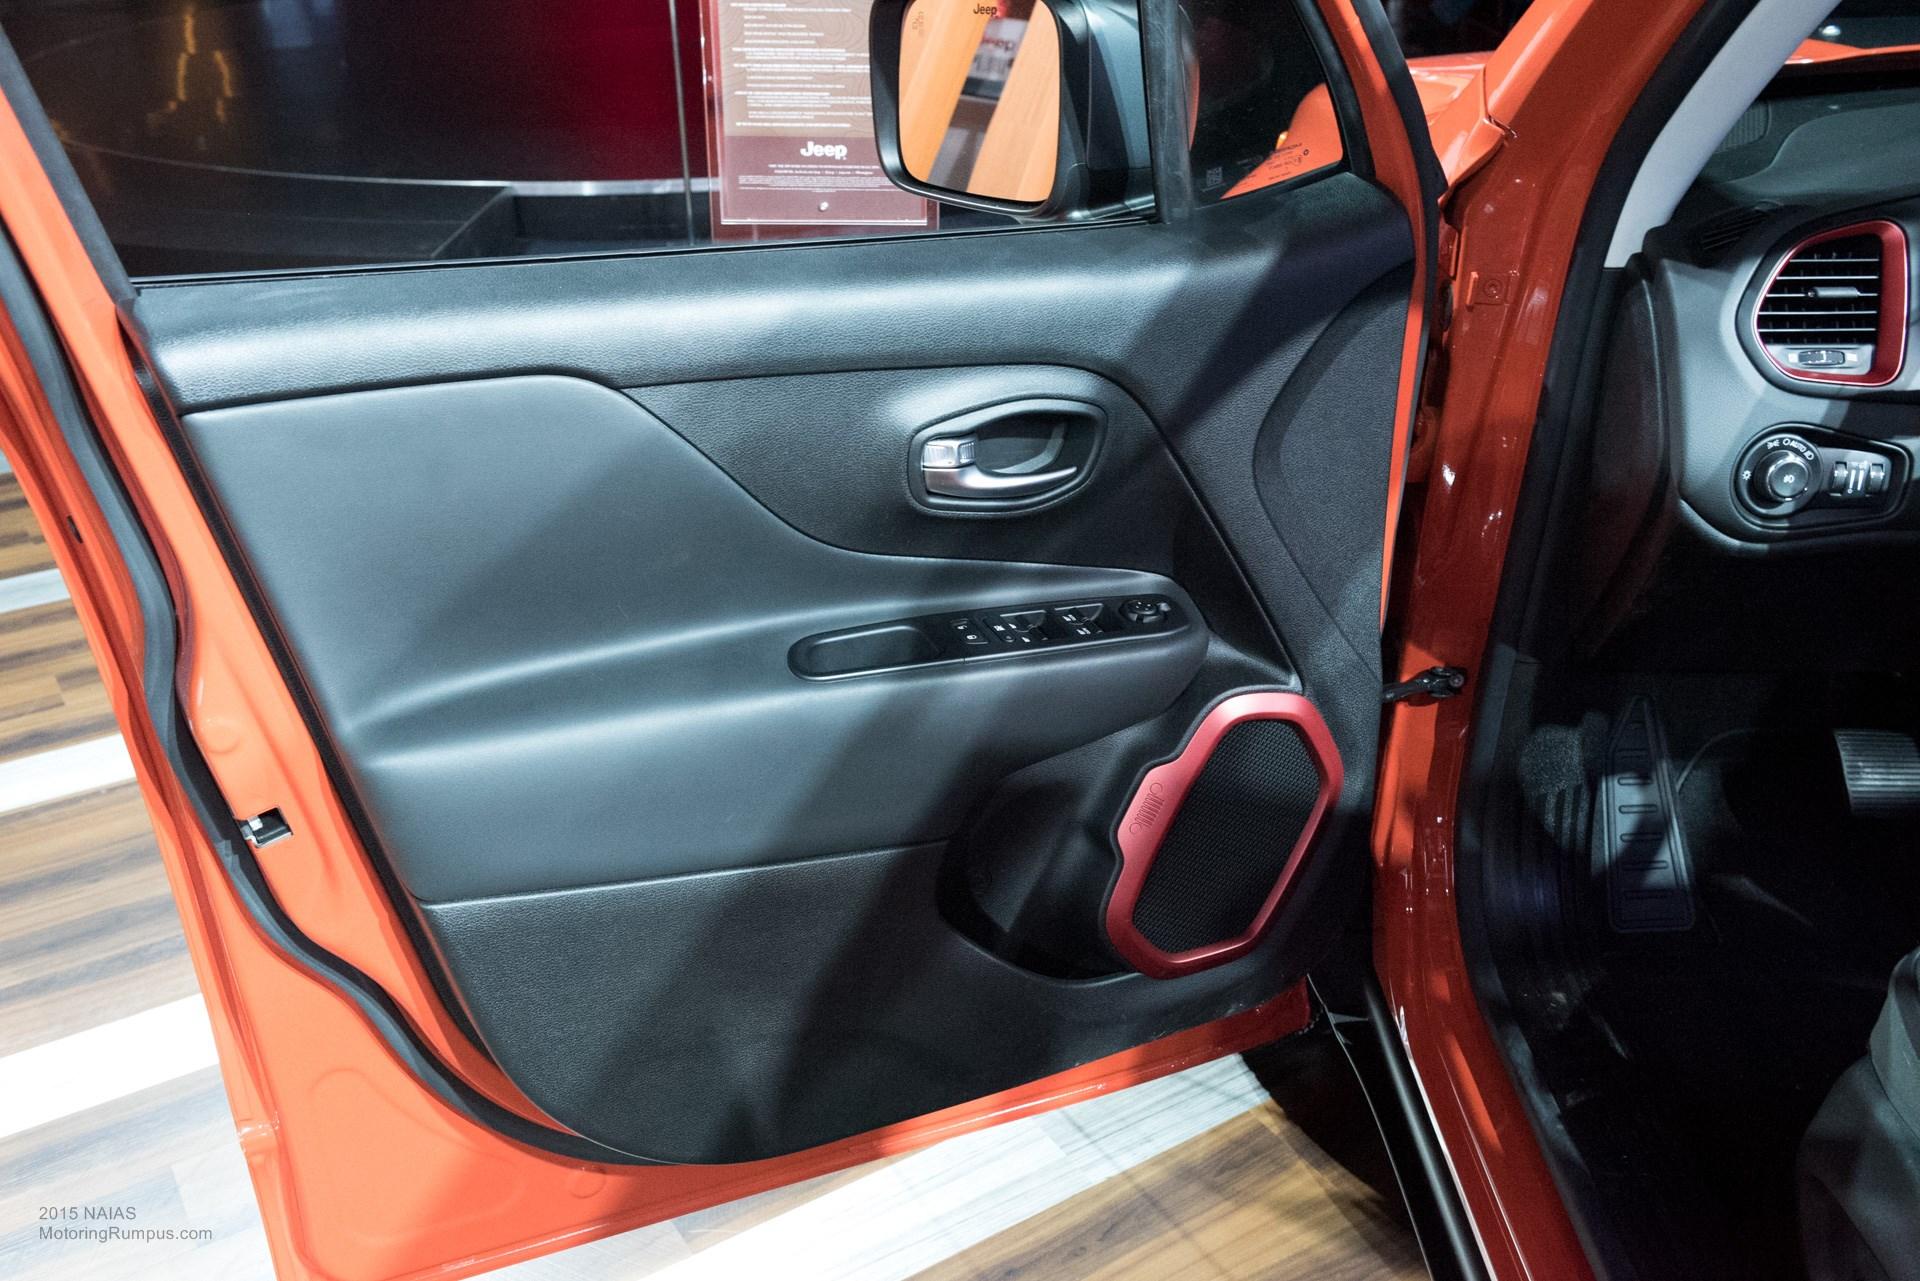 2015 NAIAS Jeep Renegade Trailhawk Interior